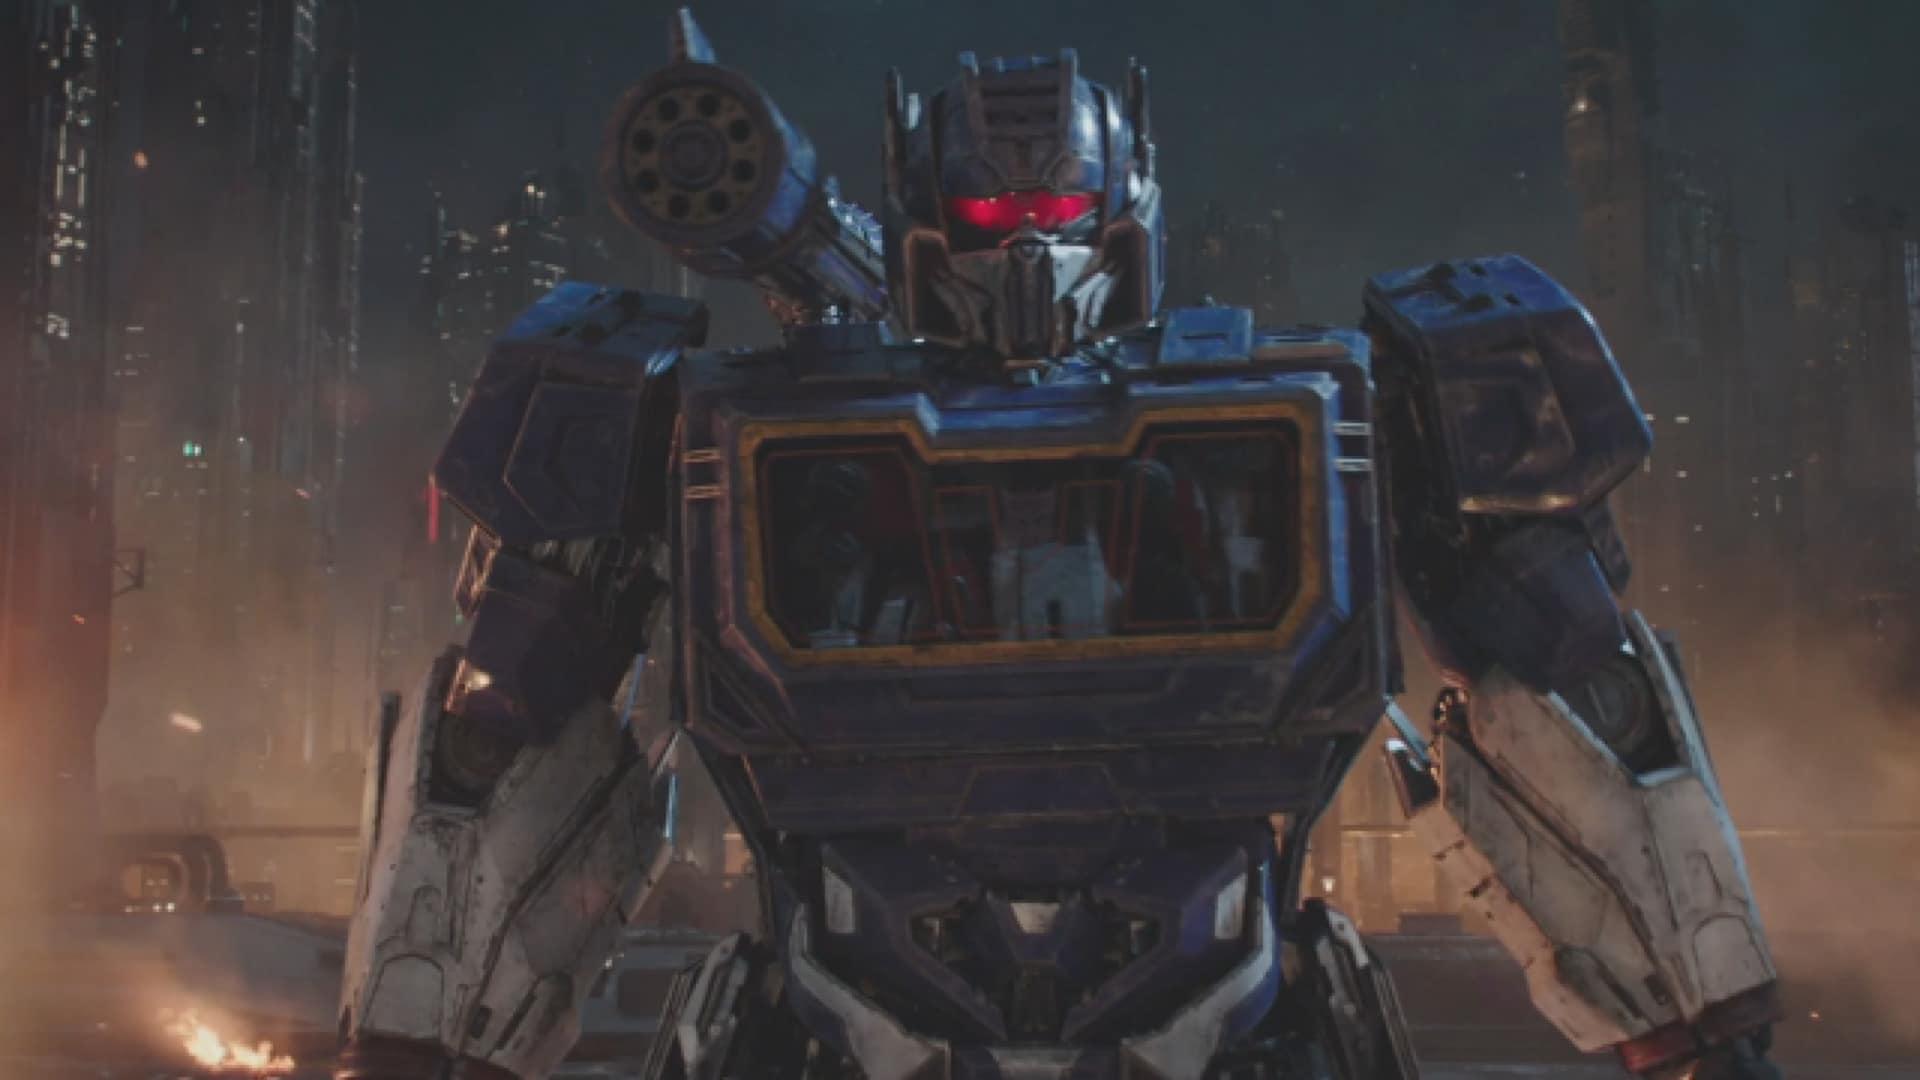 Transformers prequel in development